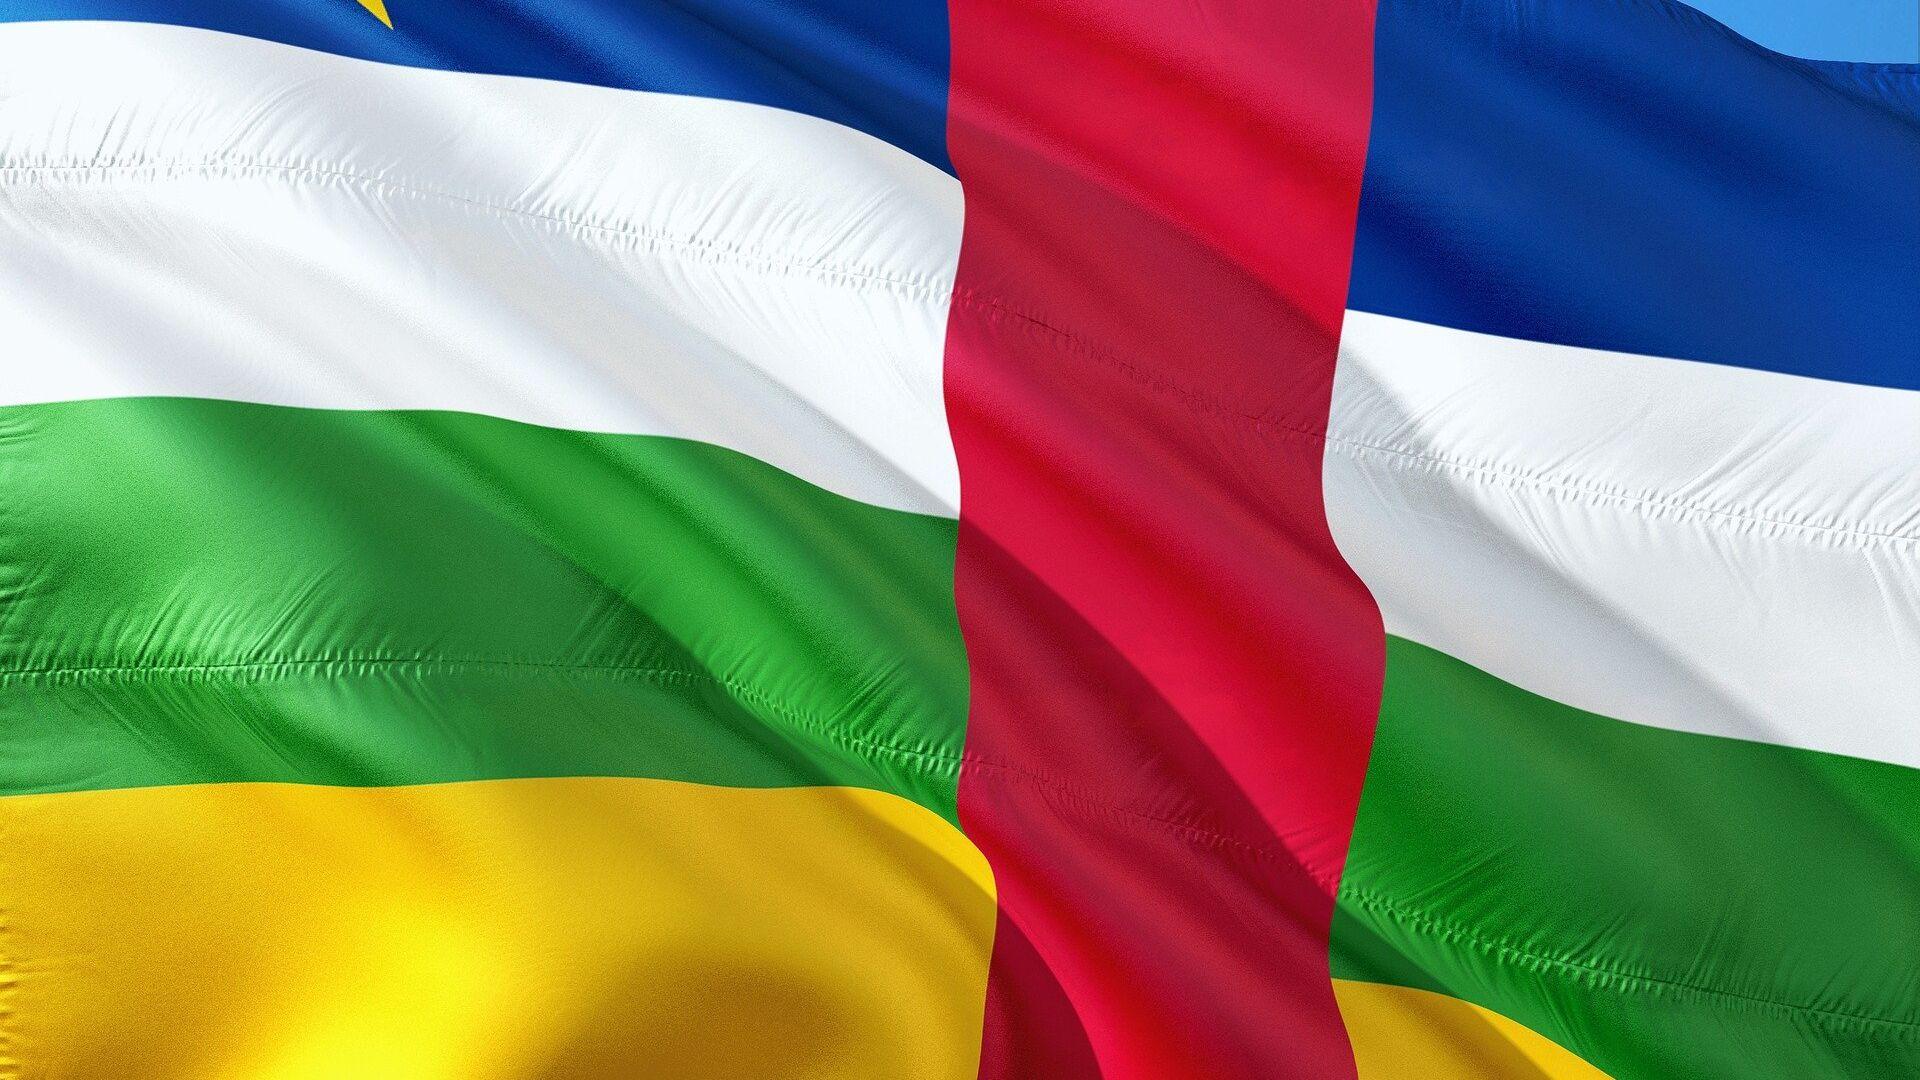 Bandera de la República Centroafricana - Sputnik Mundo, 1920, 02.06.2021